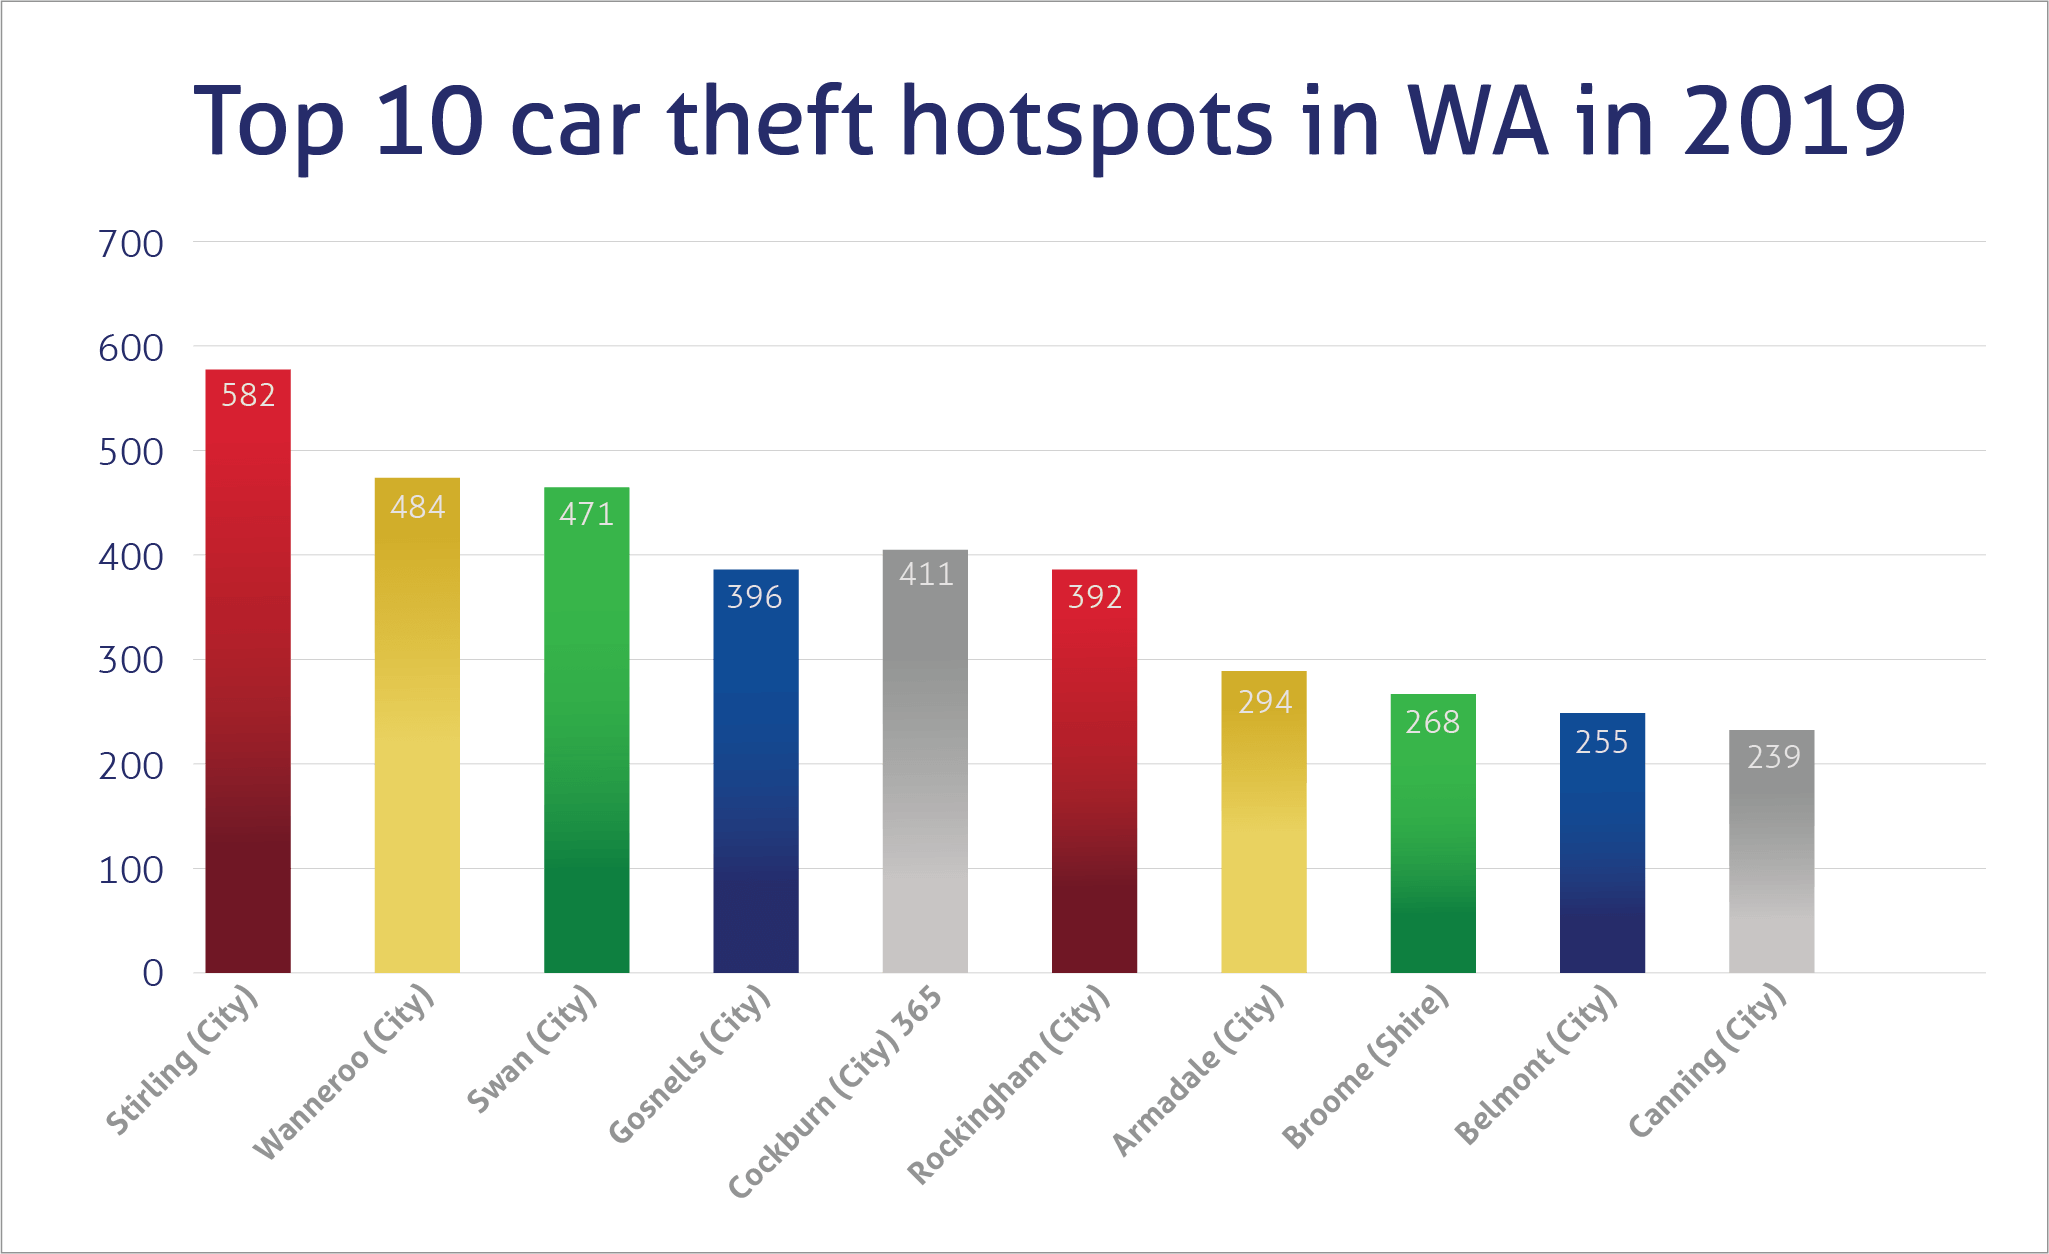 Top car theft hotspots in WA 2019